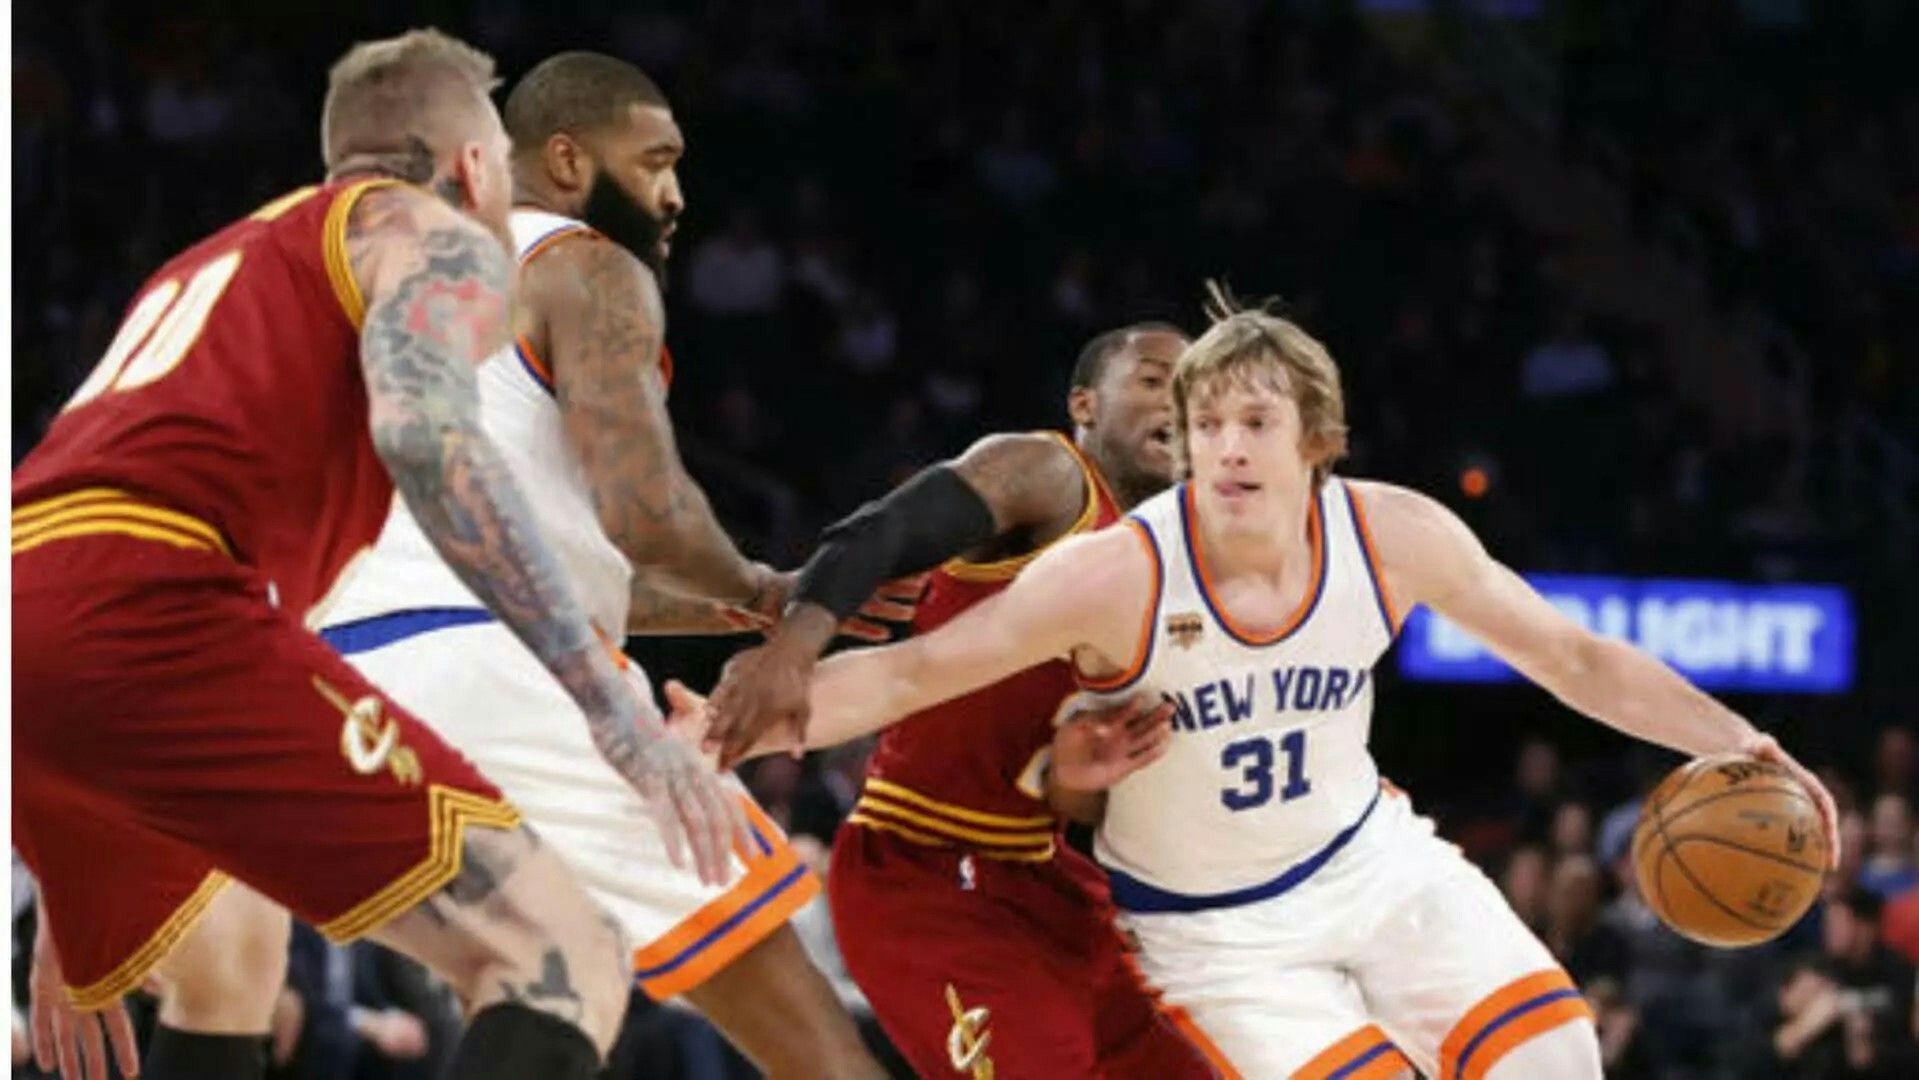 Knicks guard ron baker 31 drives around cleveland